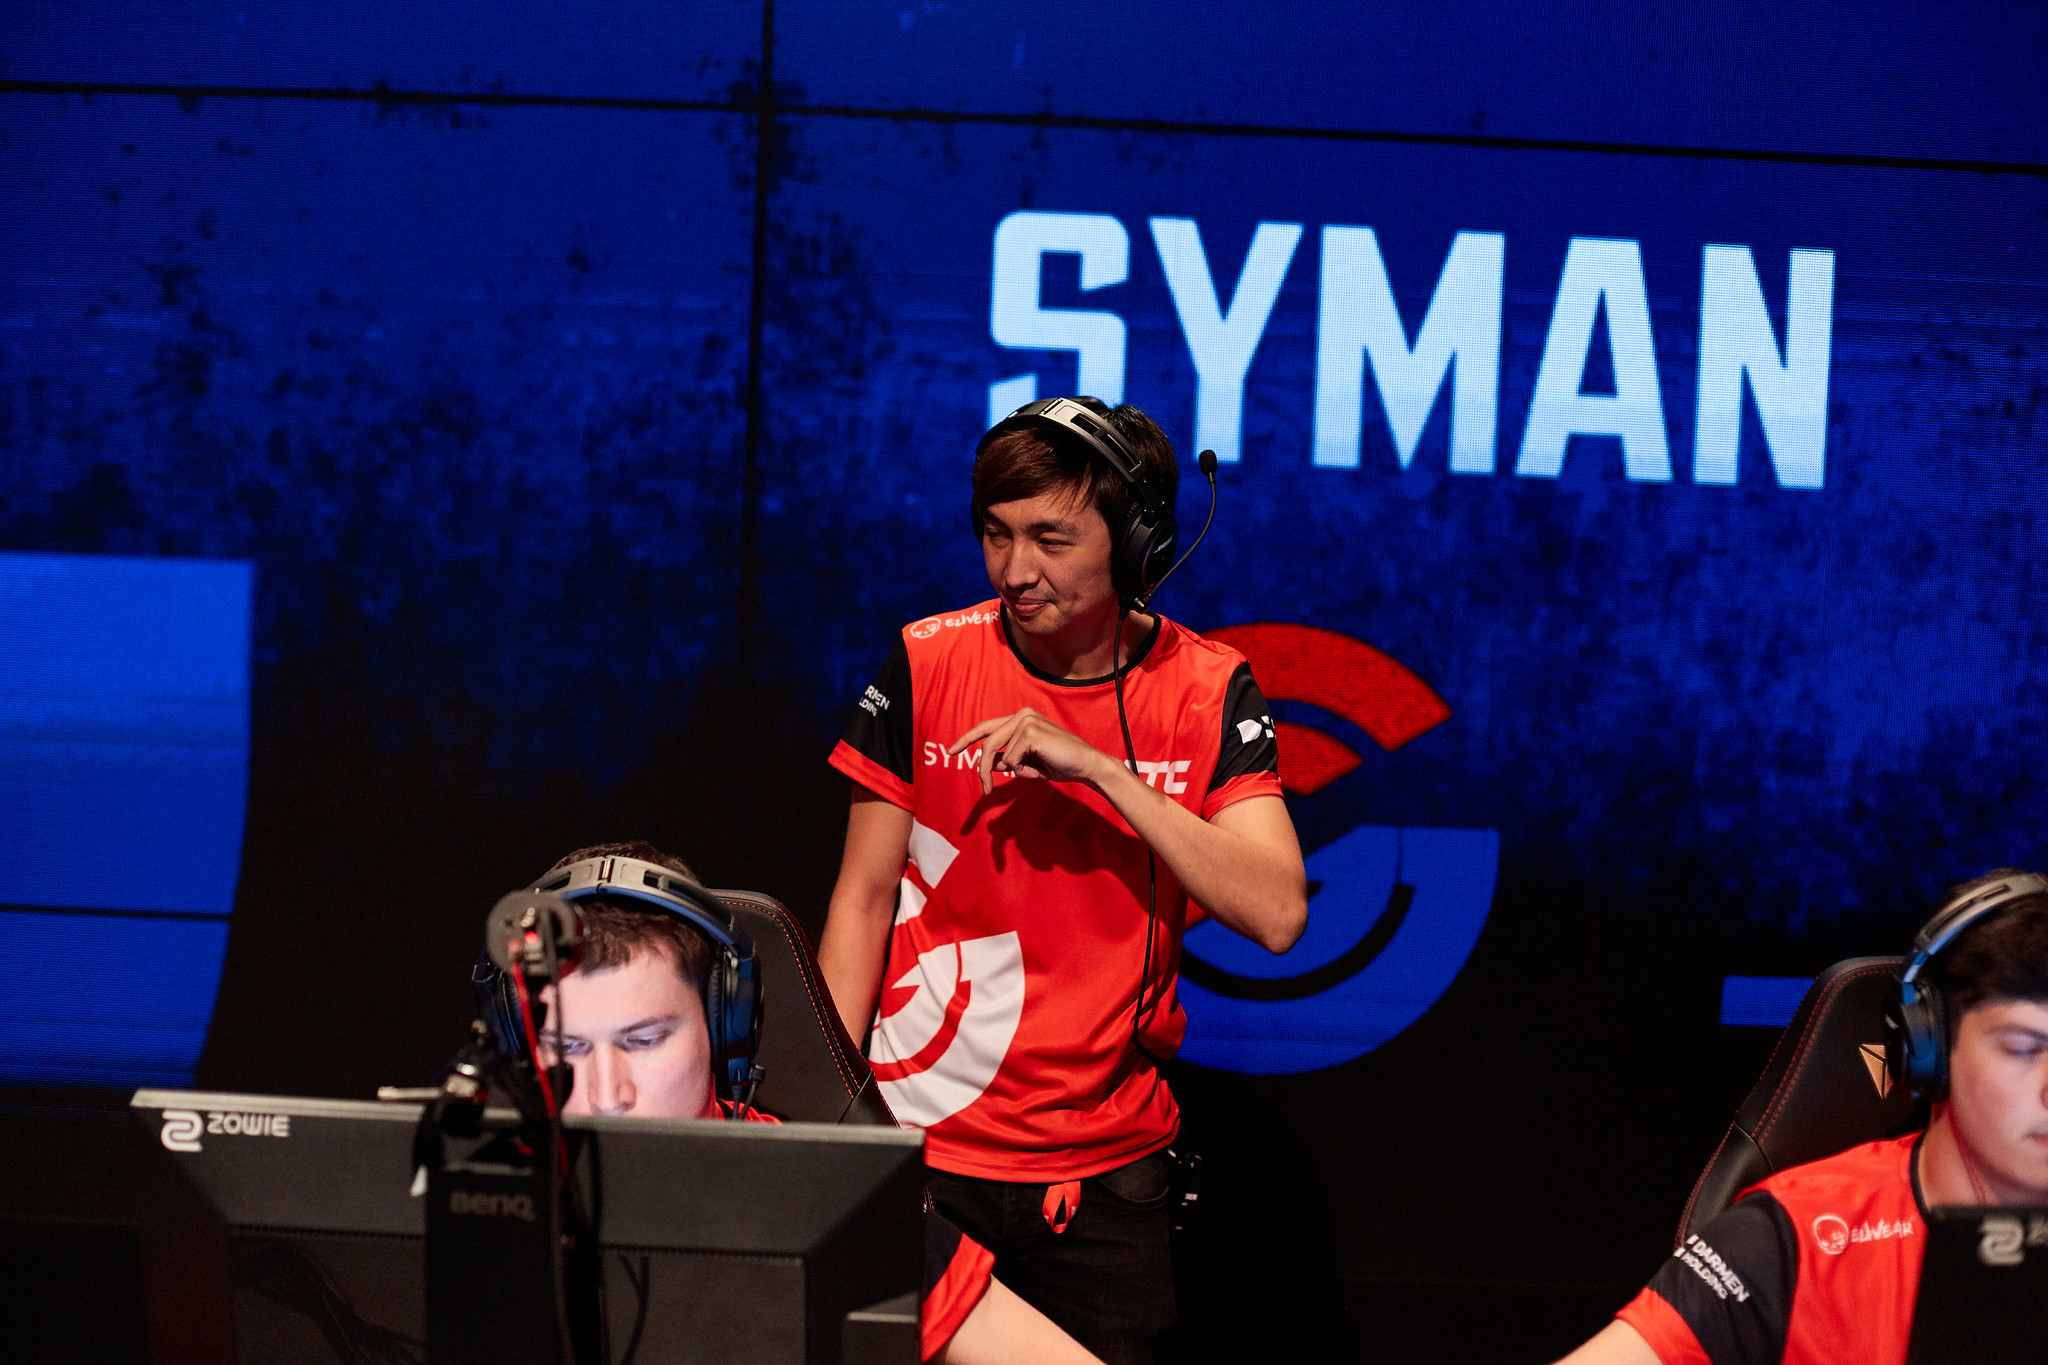 ALTERNATE aTTaX - Syman Gaming